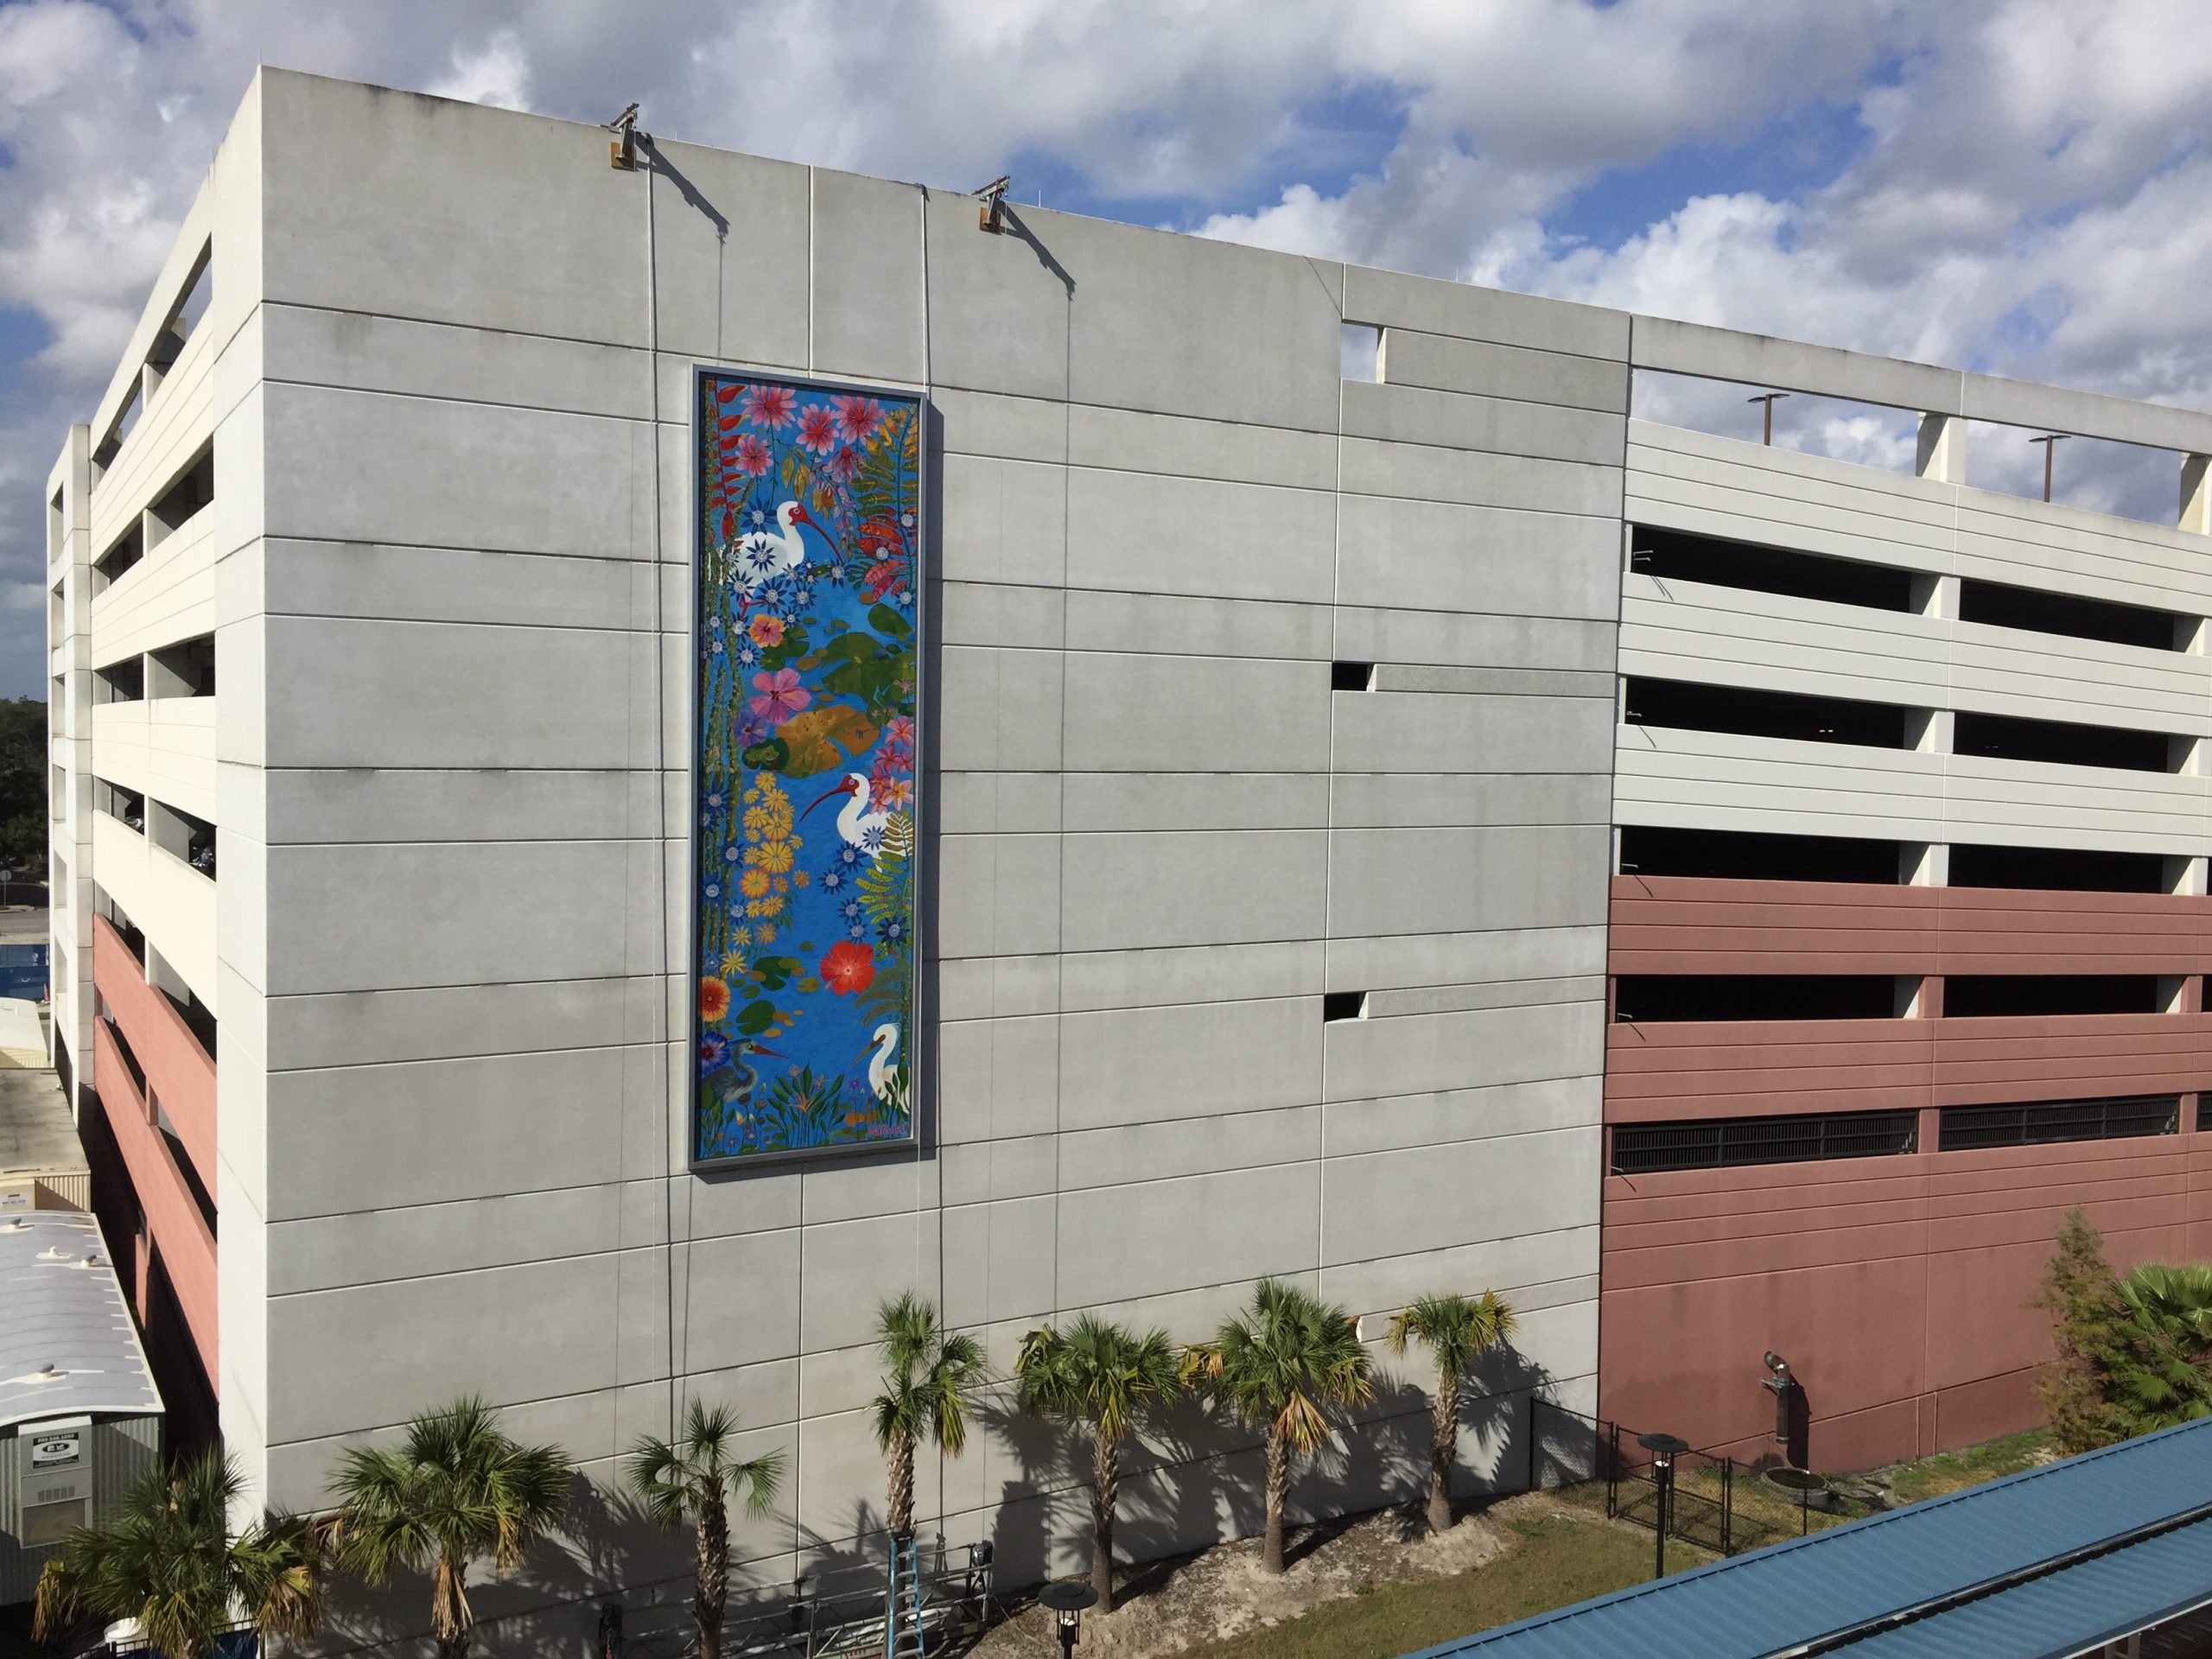 McRae Parking Garage – SunRail Station Mural